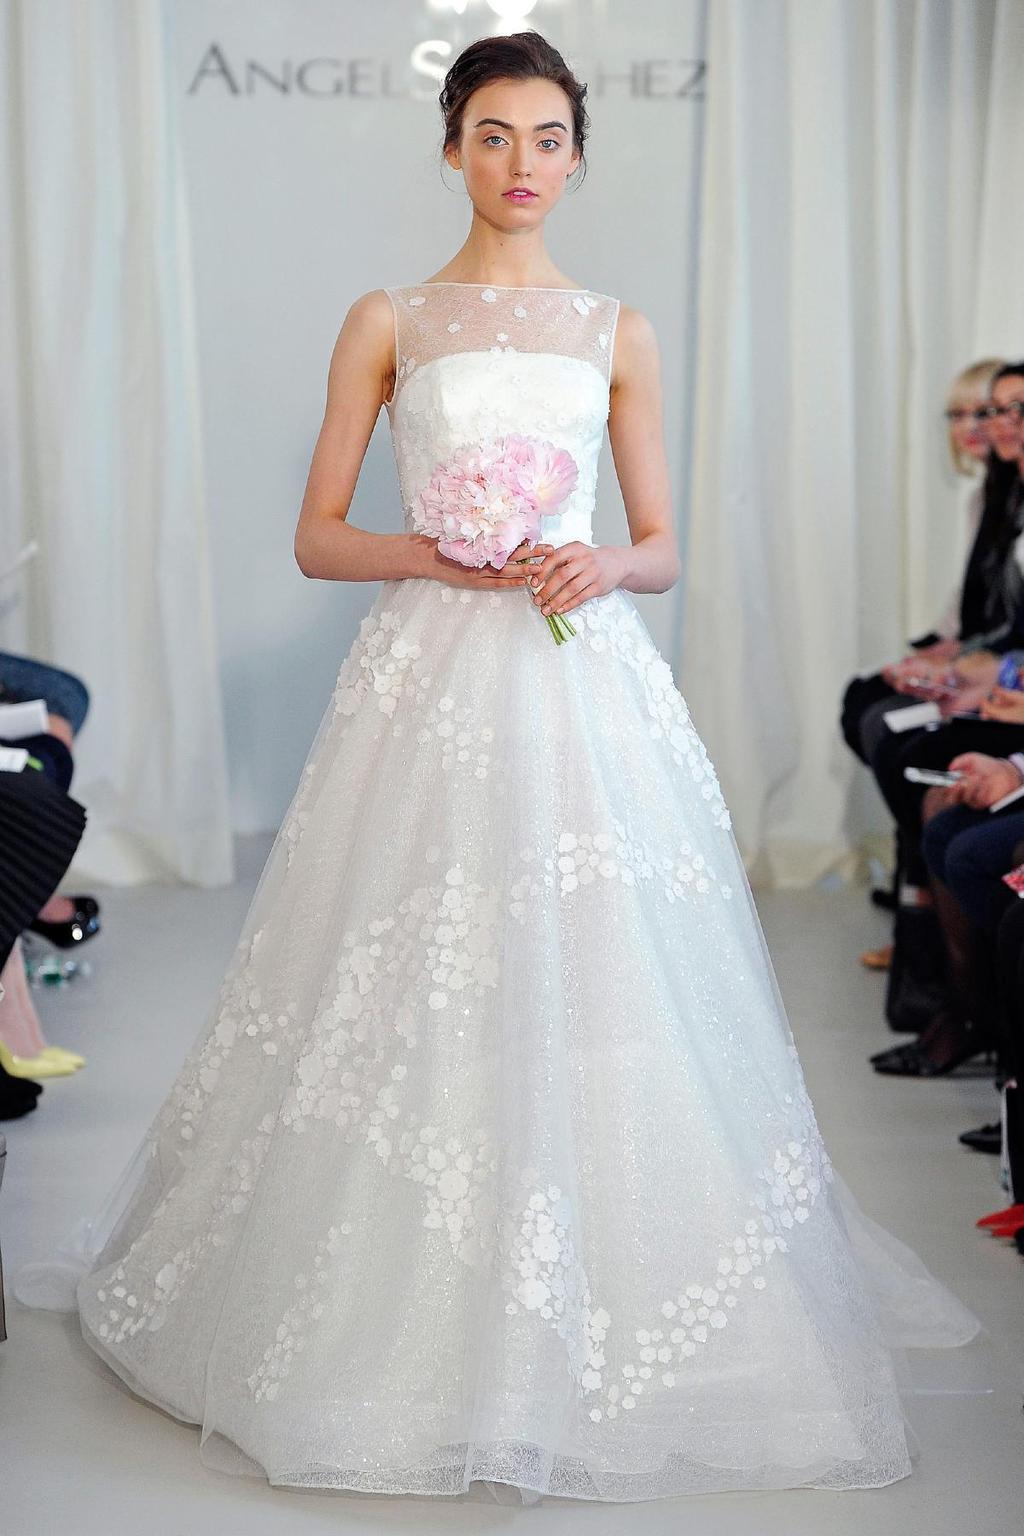 Angel-sanchez-wedding-dress-spring-2014-bridal-14.full